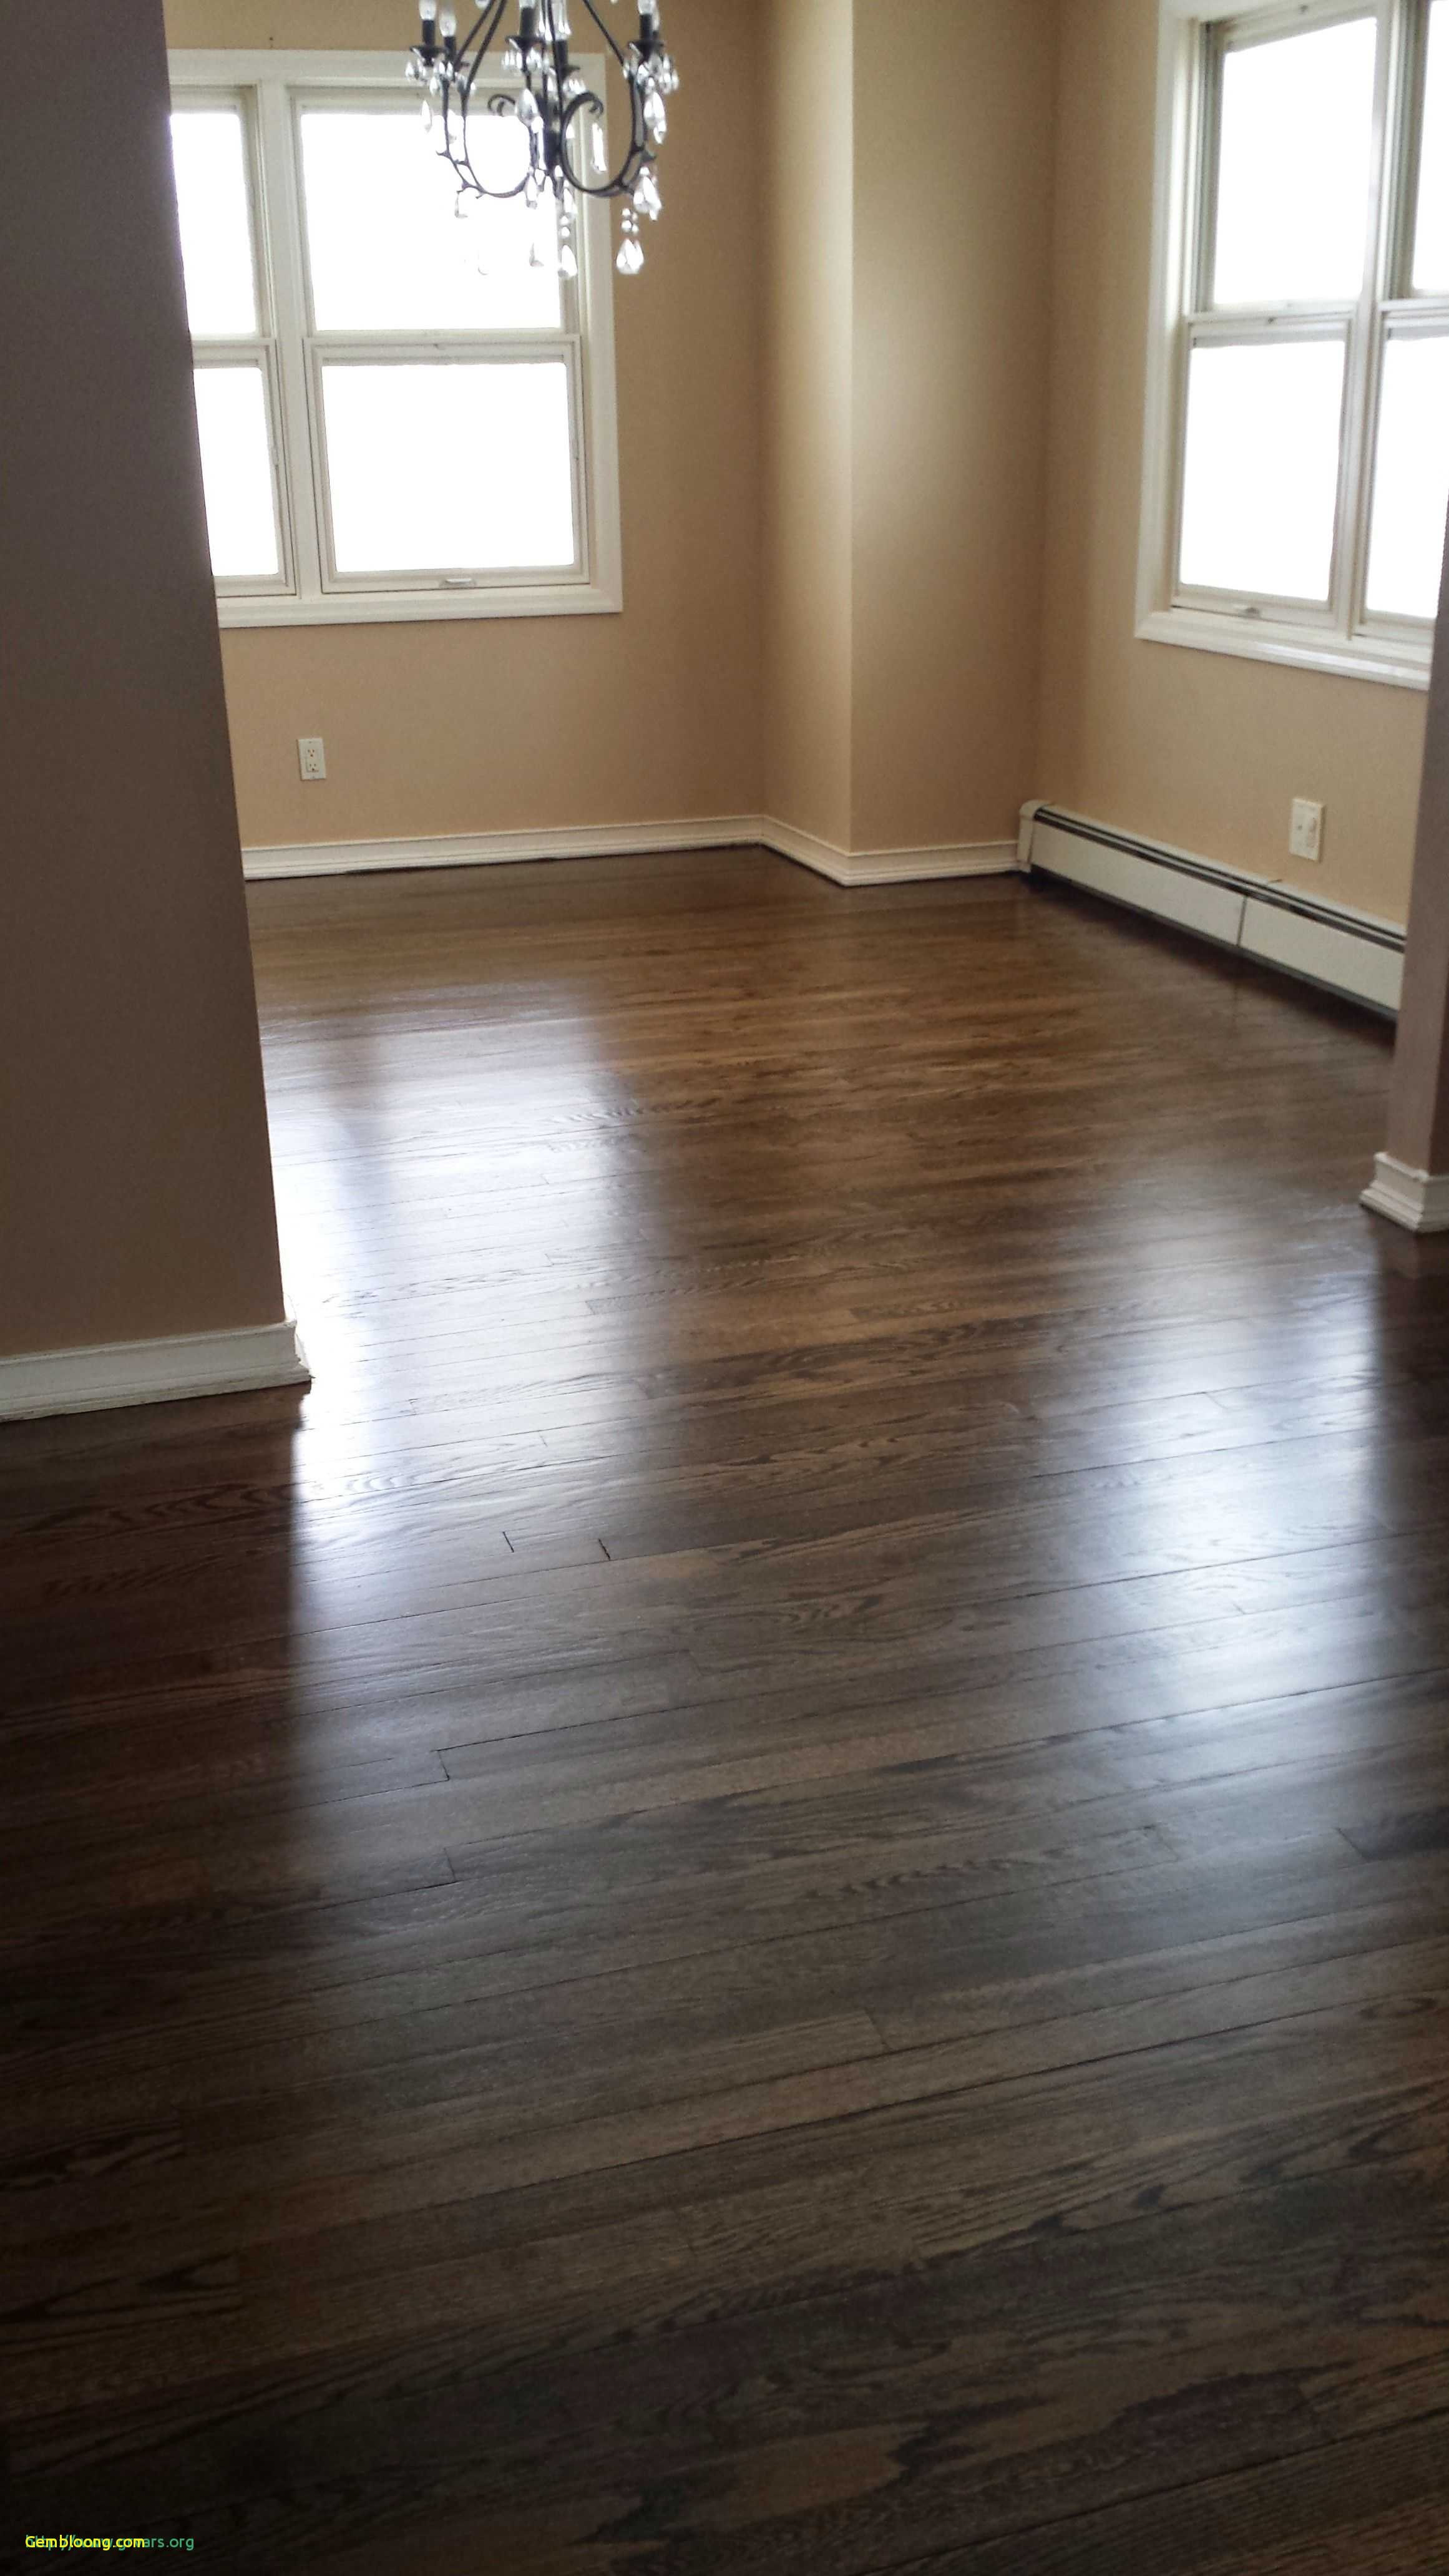 kentucky hardwood flooring of 20 beautiful discount flooring near me flooring ideas with 20 s of the 20 charmant how to refinish hardwood floors cheap